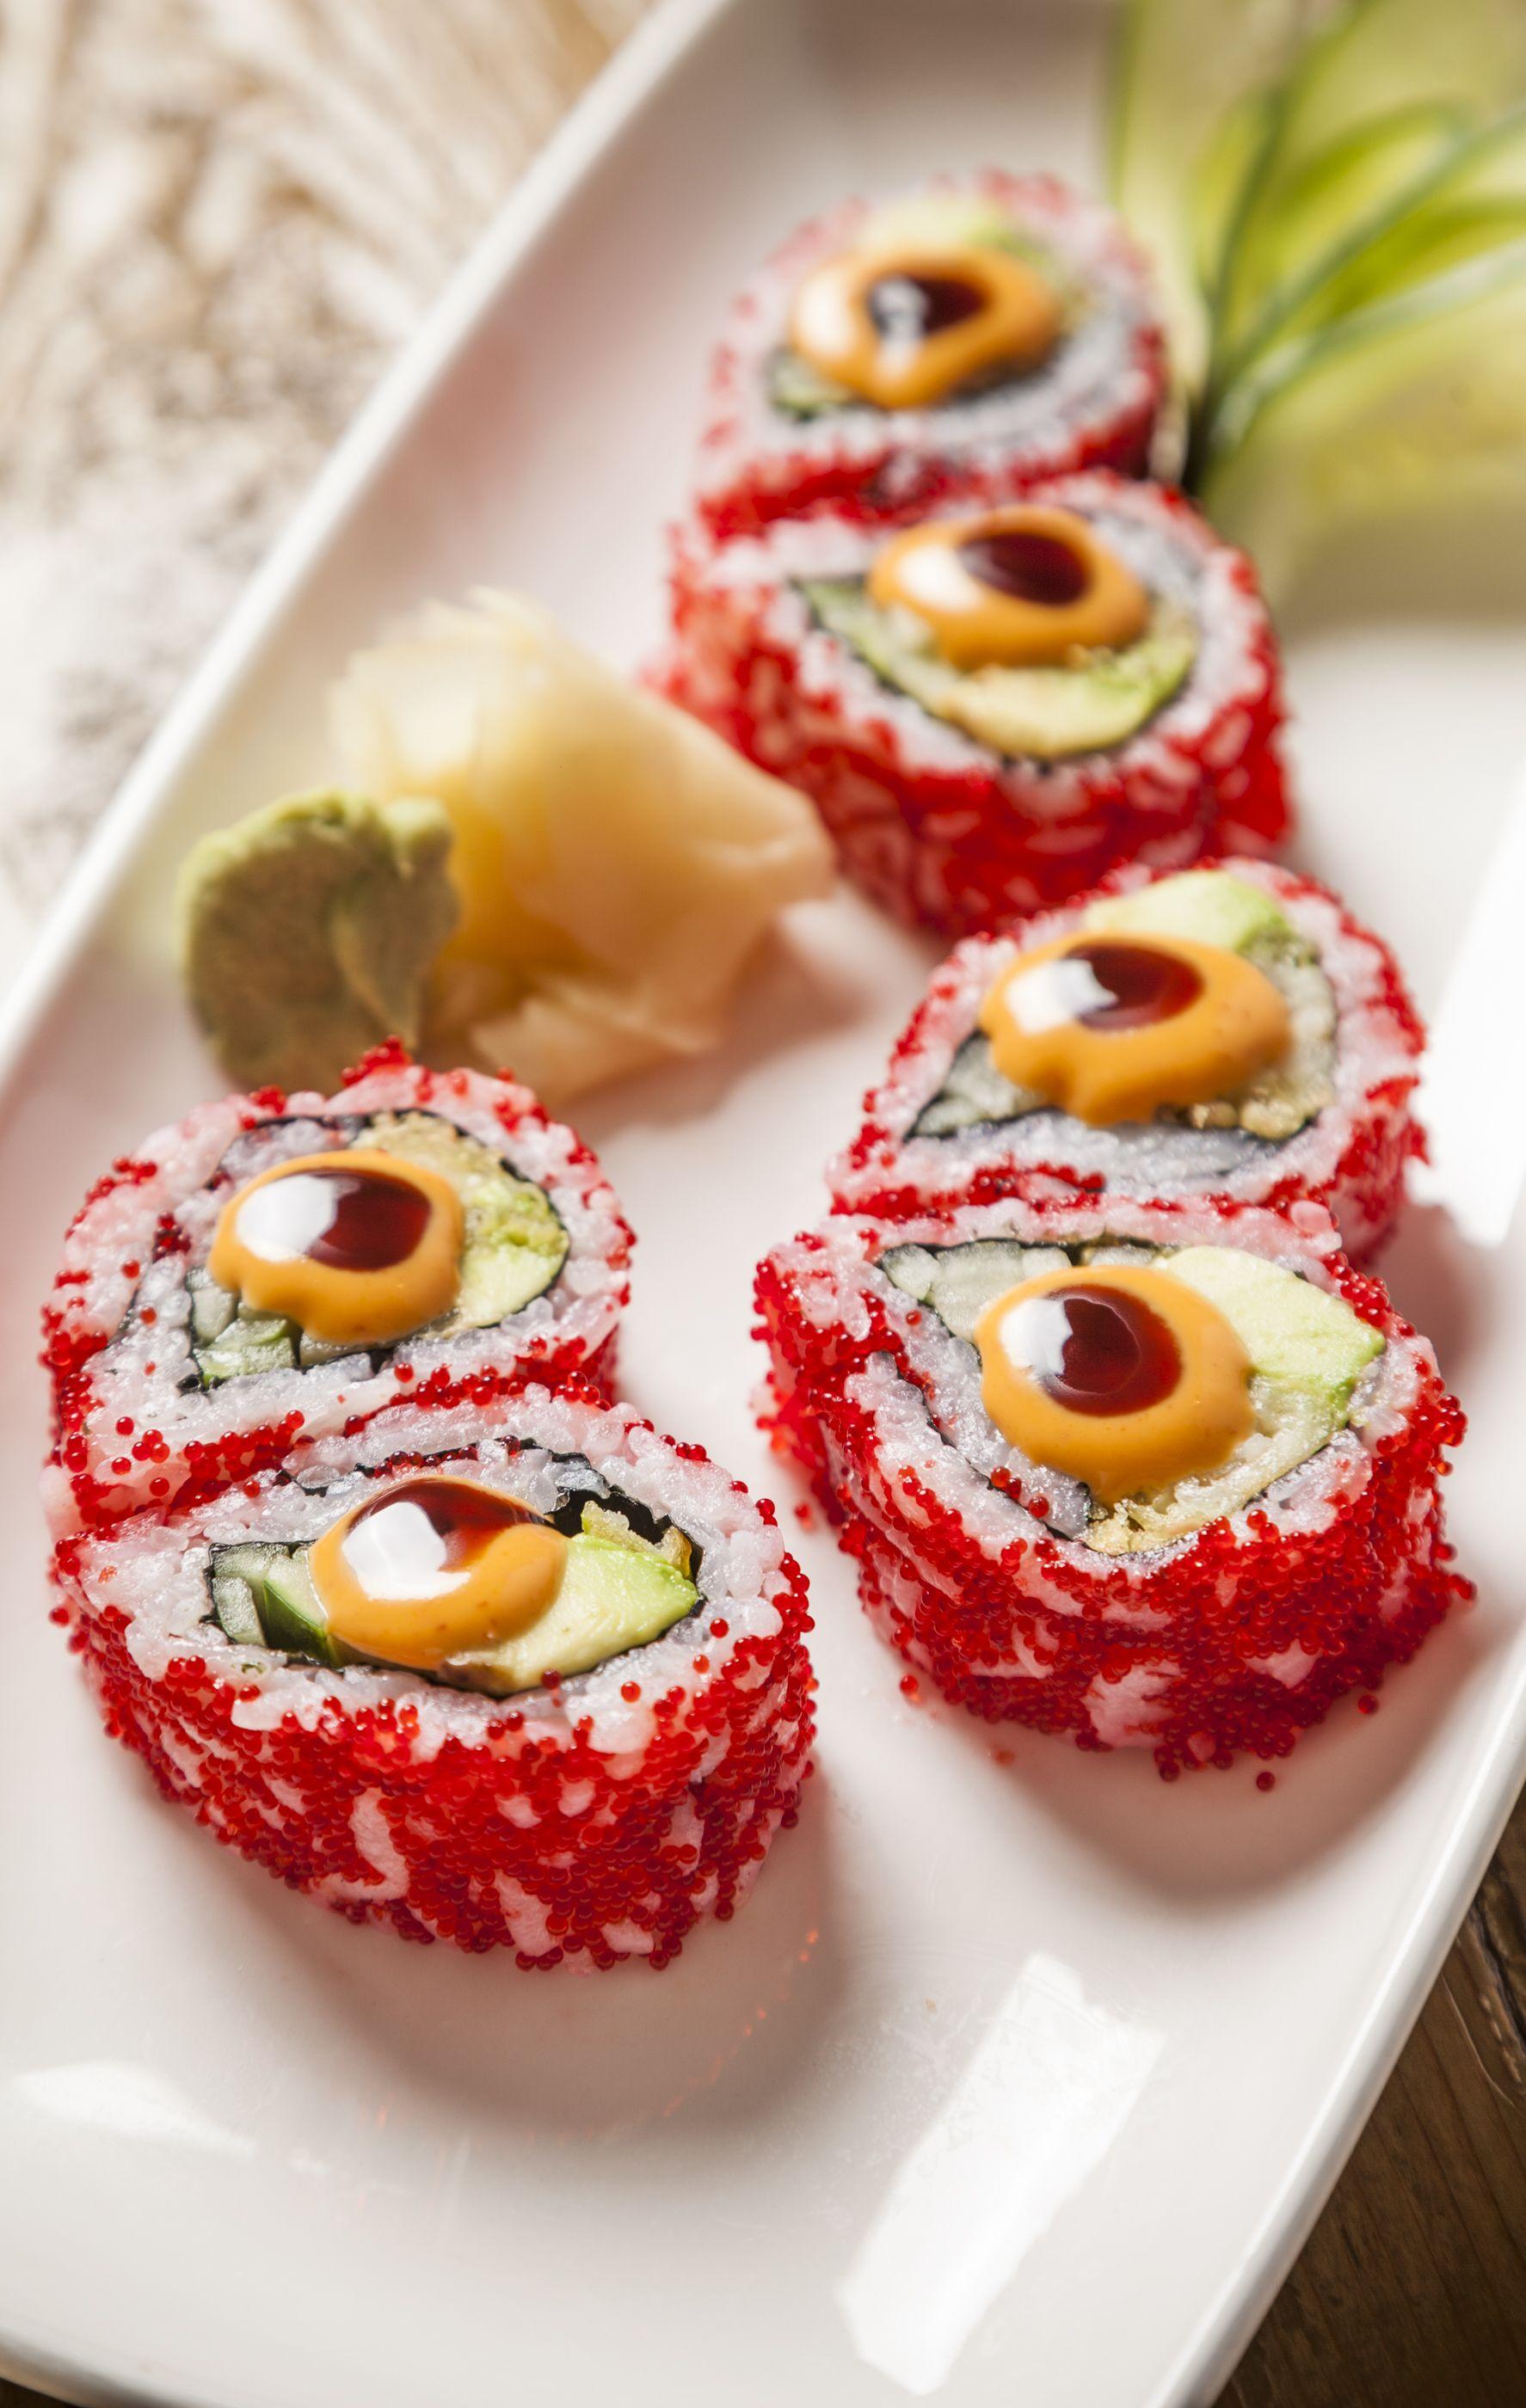 Burning love roll shrimp tempura cucumber and avocado on